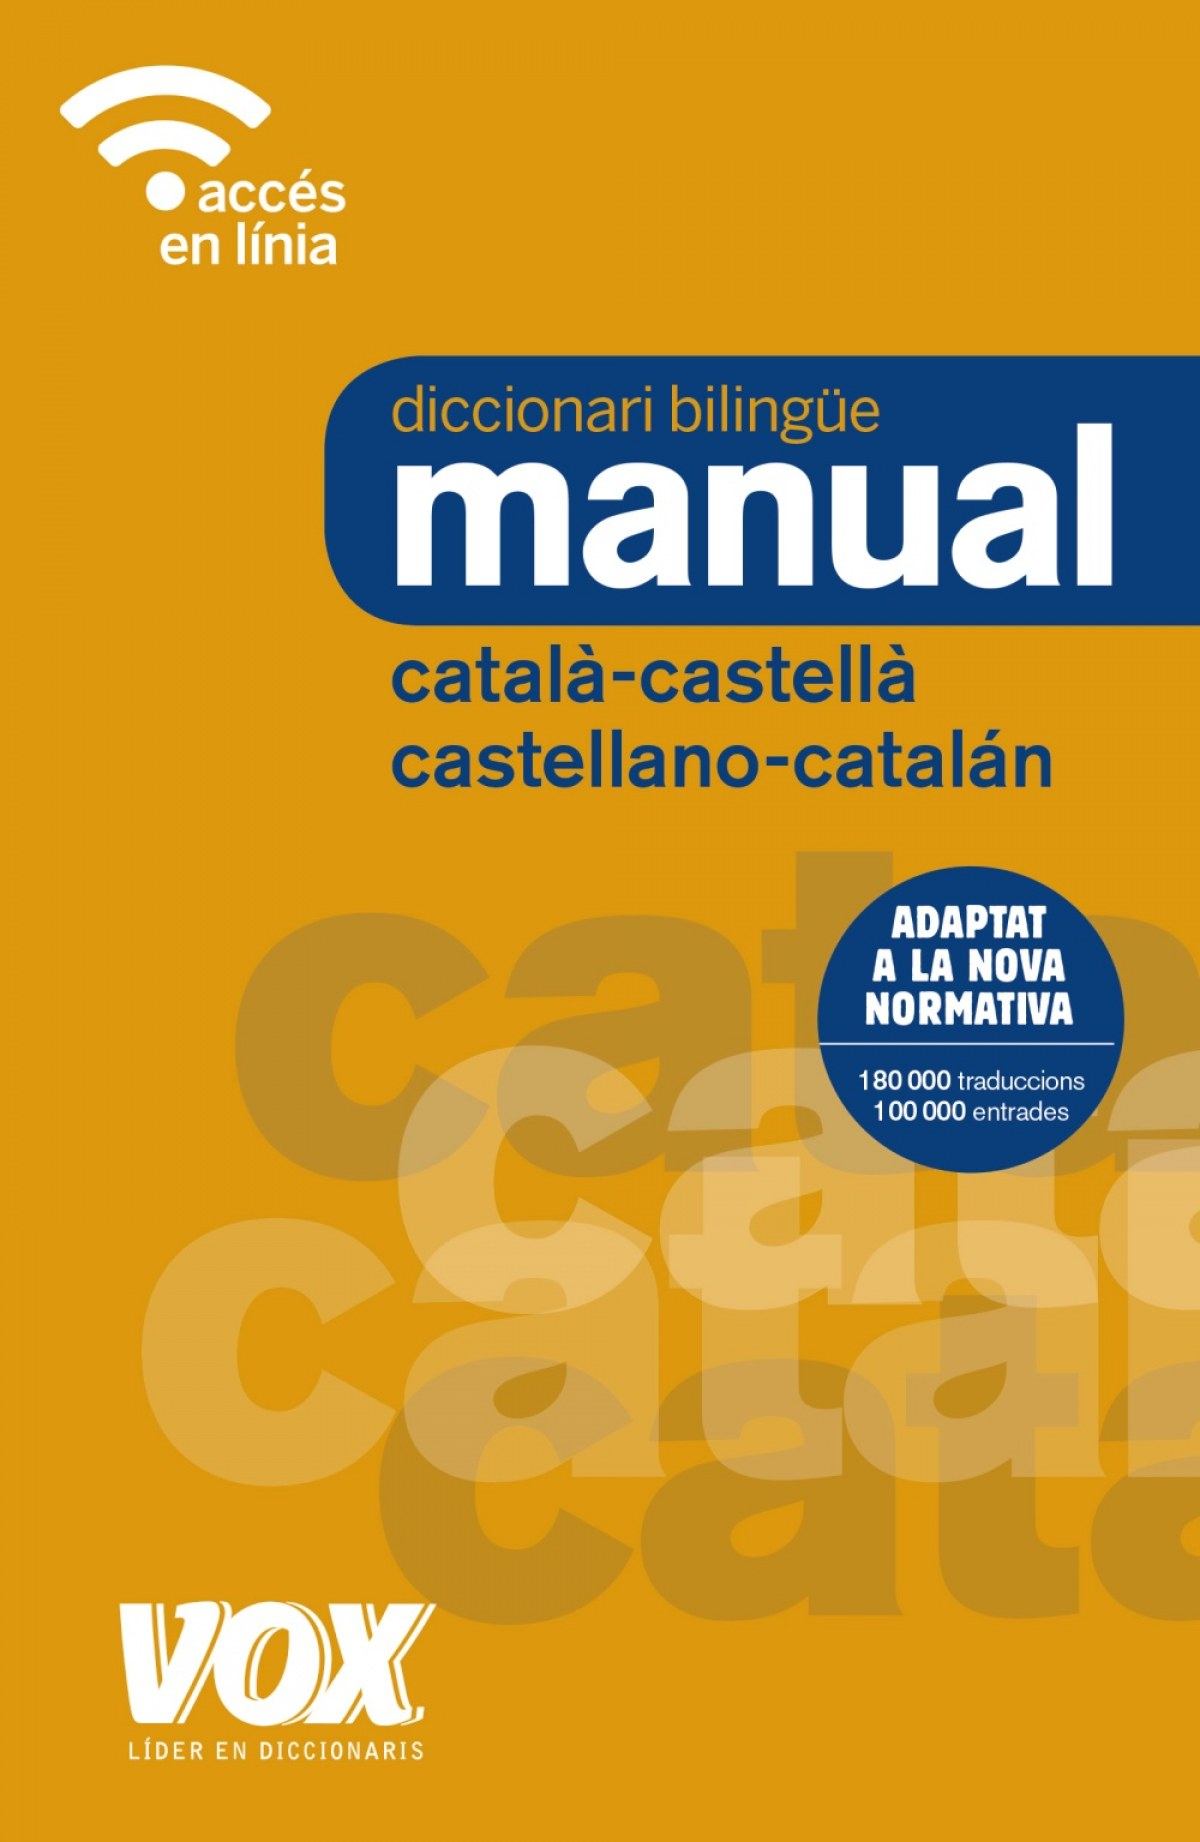 DICCIONARI MANUAL CATALÀ-CASTELLA/CASTELLANO-CATALÁN 9788499742731